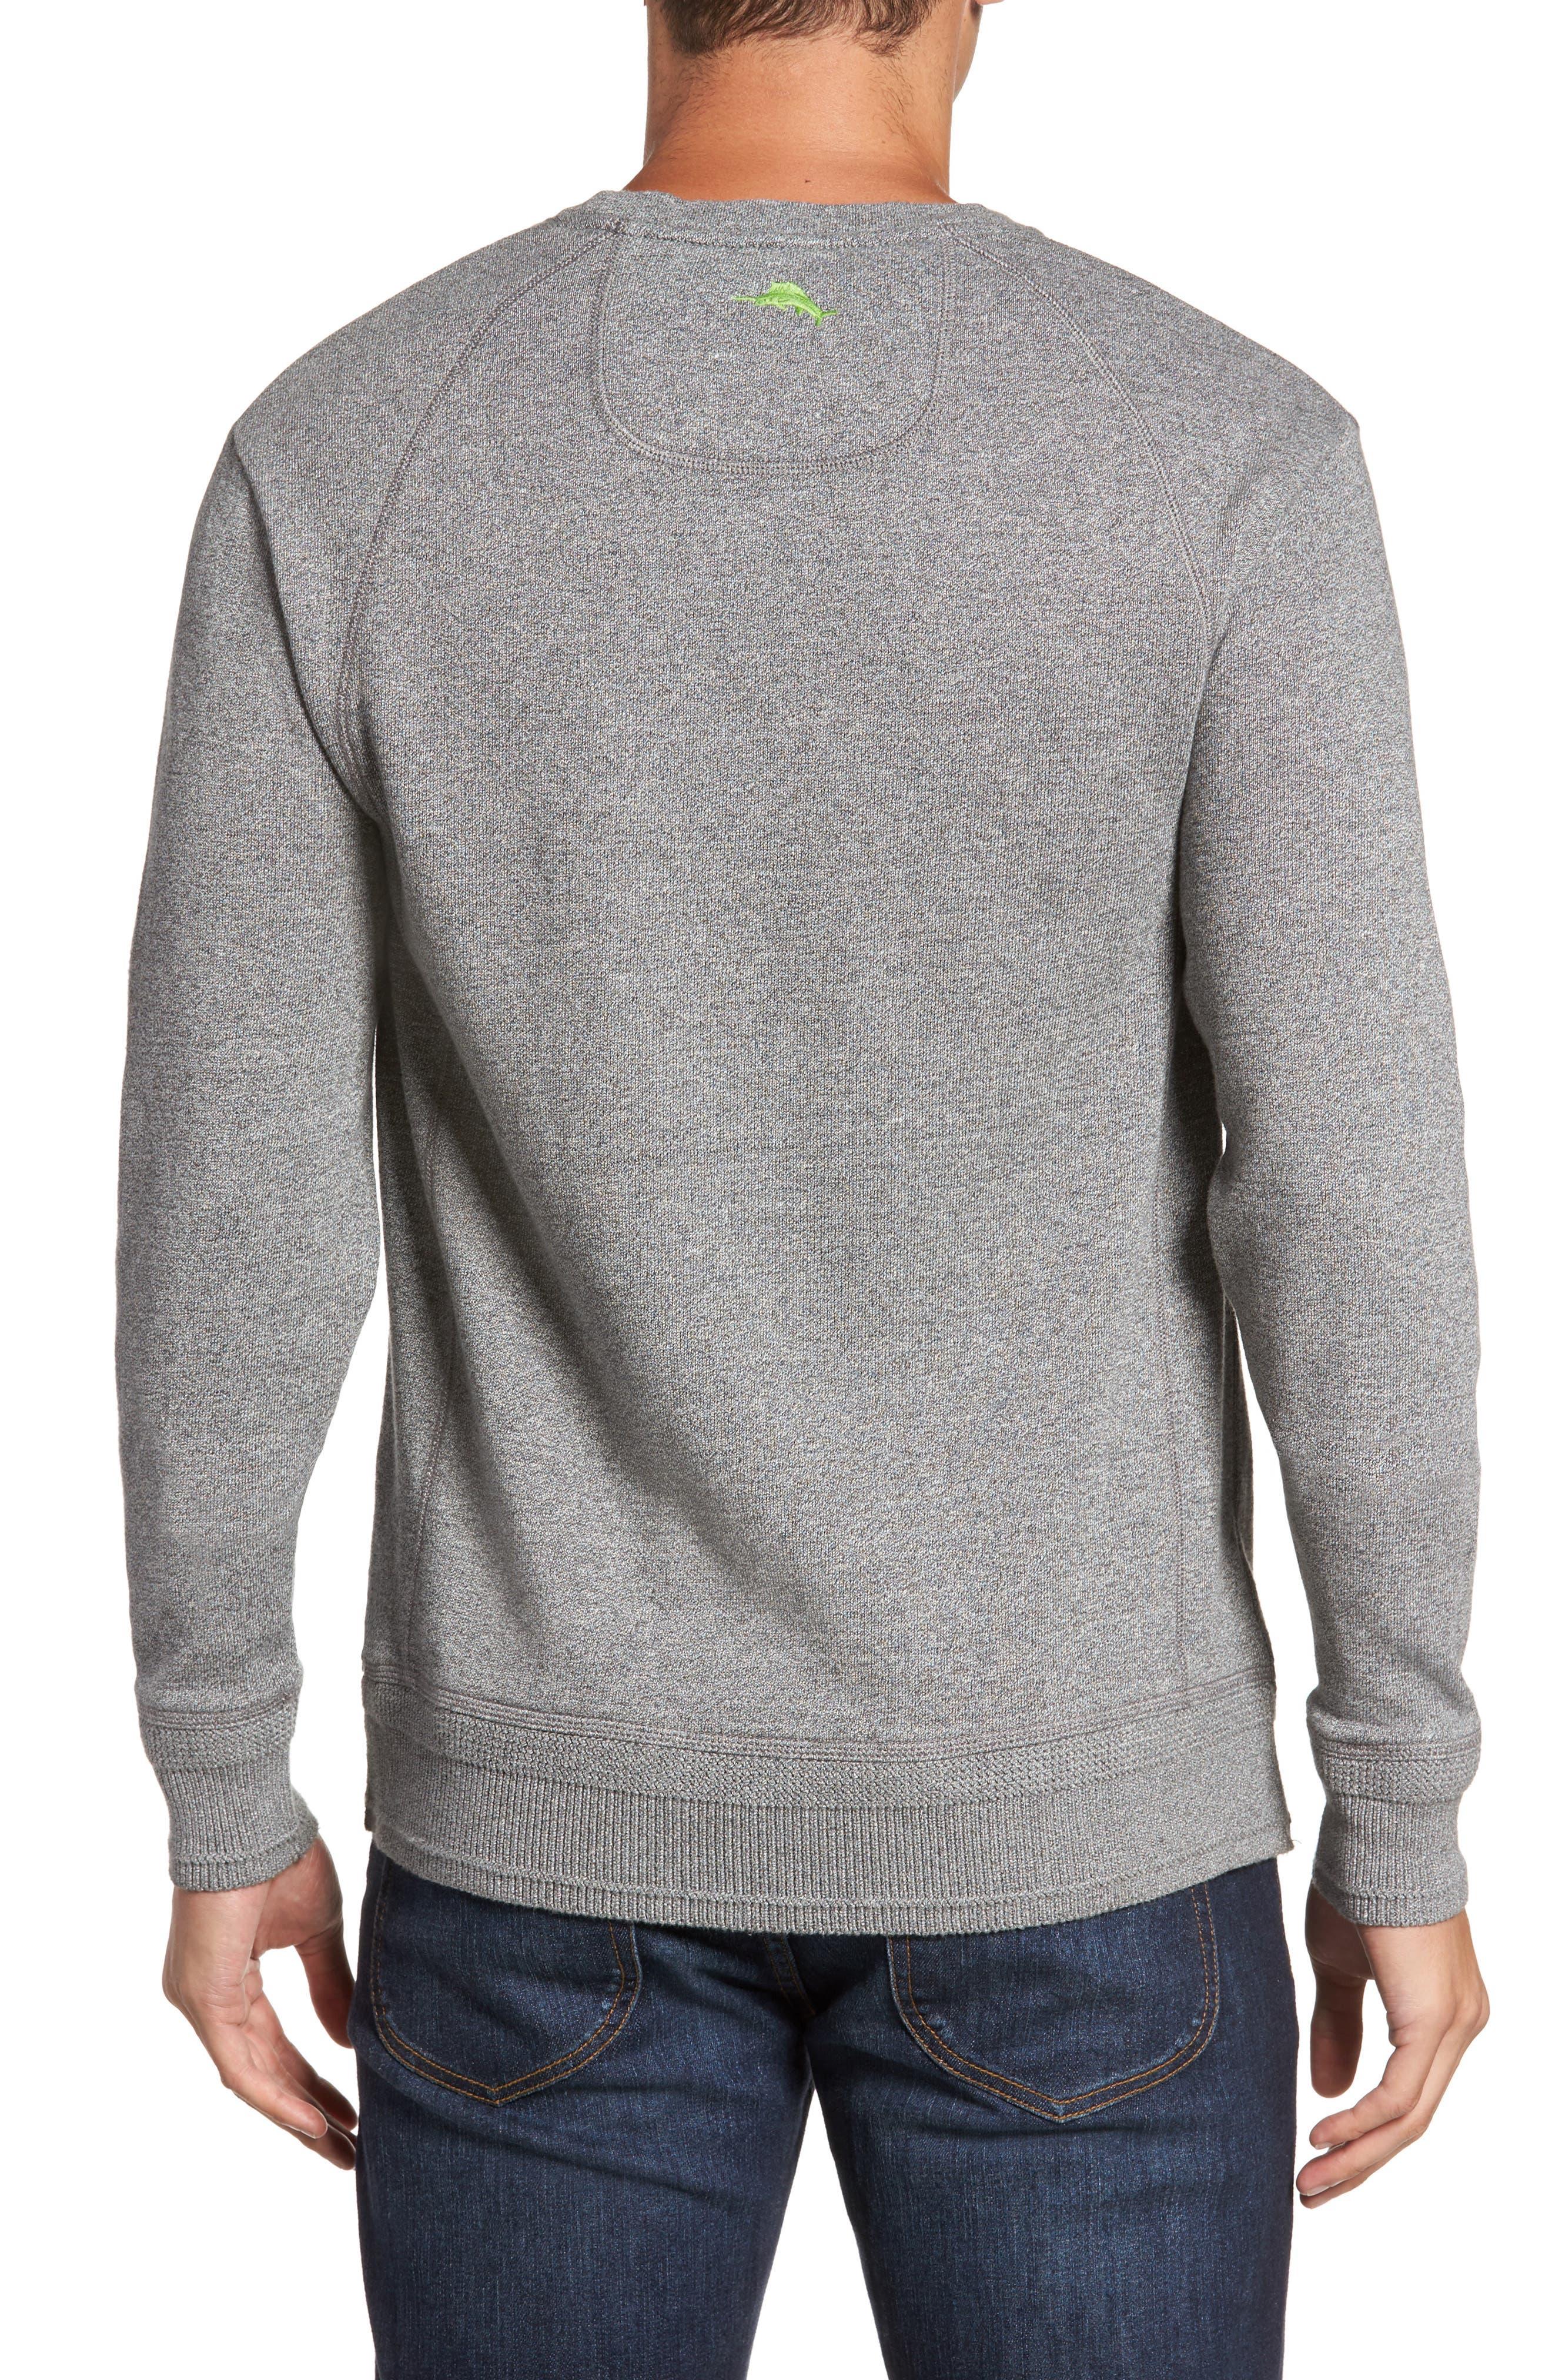 NFL Stitch of Liberty Embroidered Crewneck Sweatshirt,                             Alternate thumbnail 58, color,